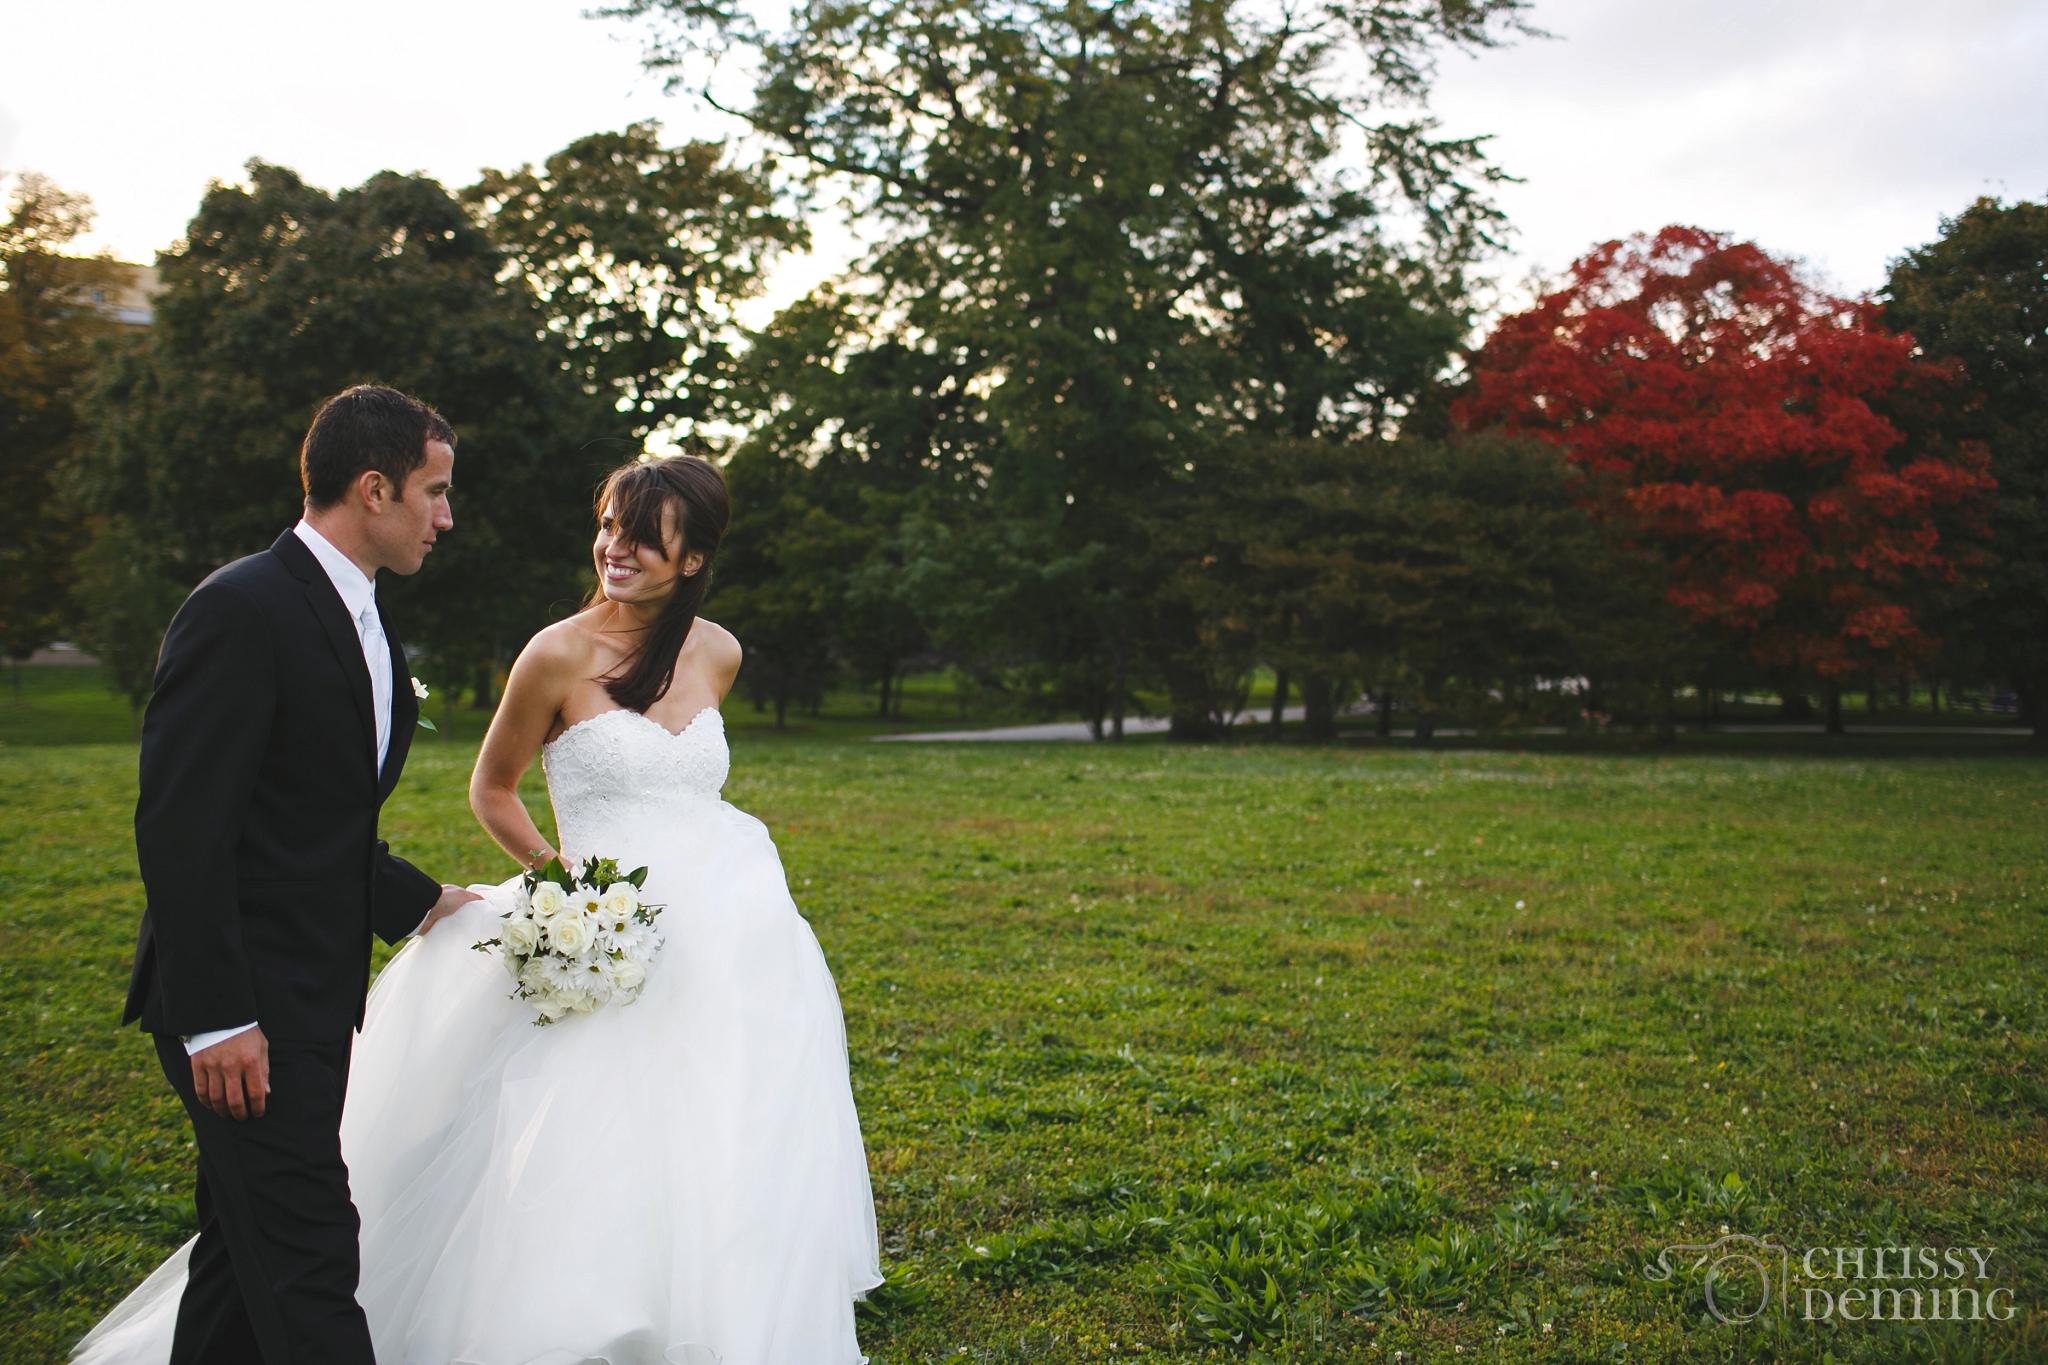 promontory_point_chicago_wedding_photography_0027.jpg